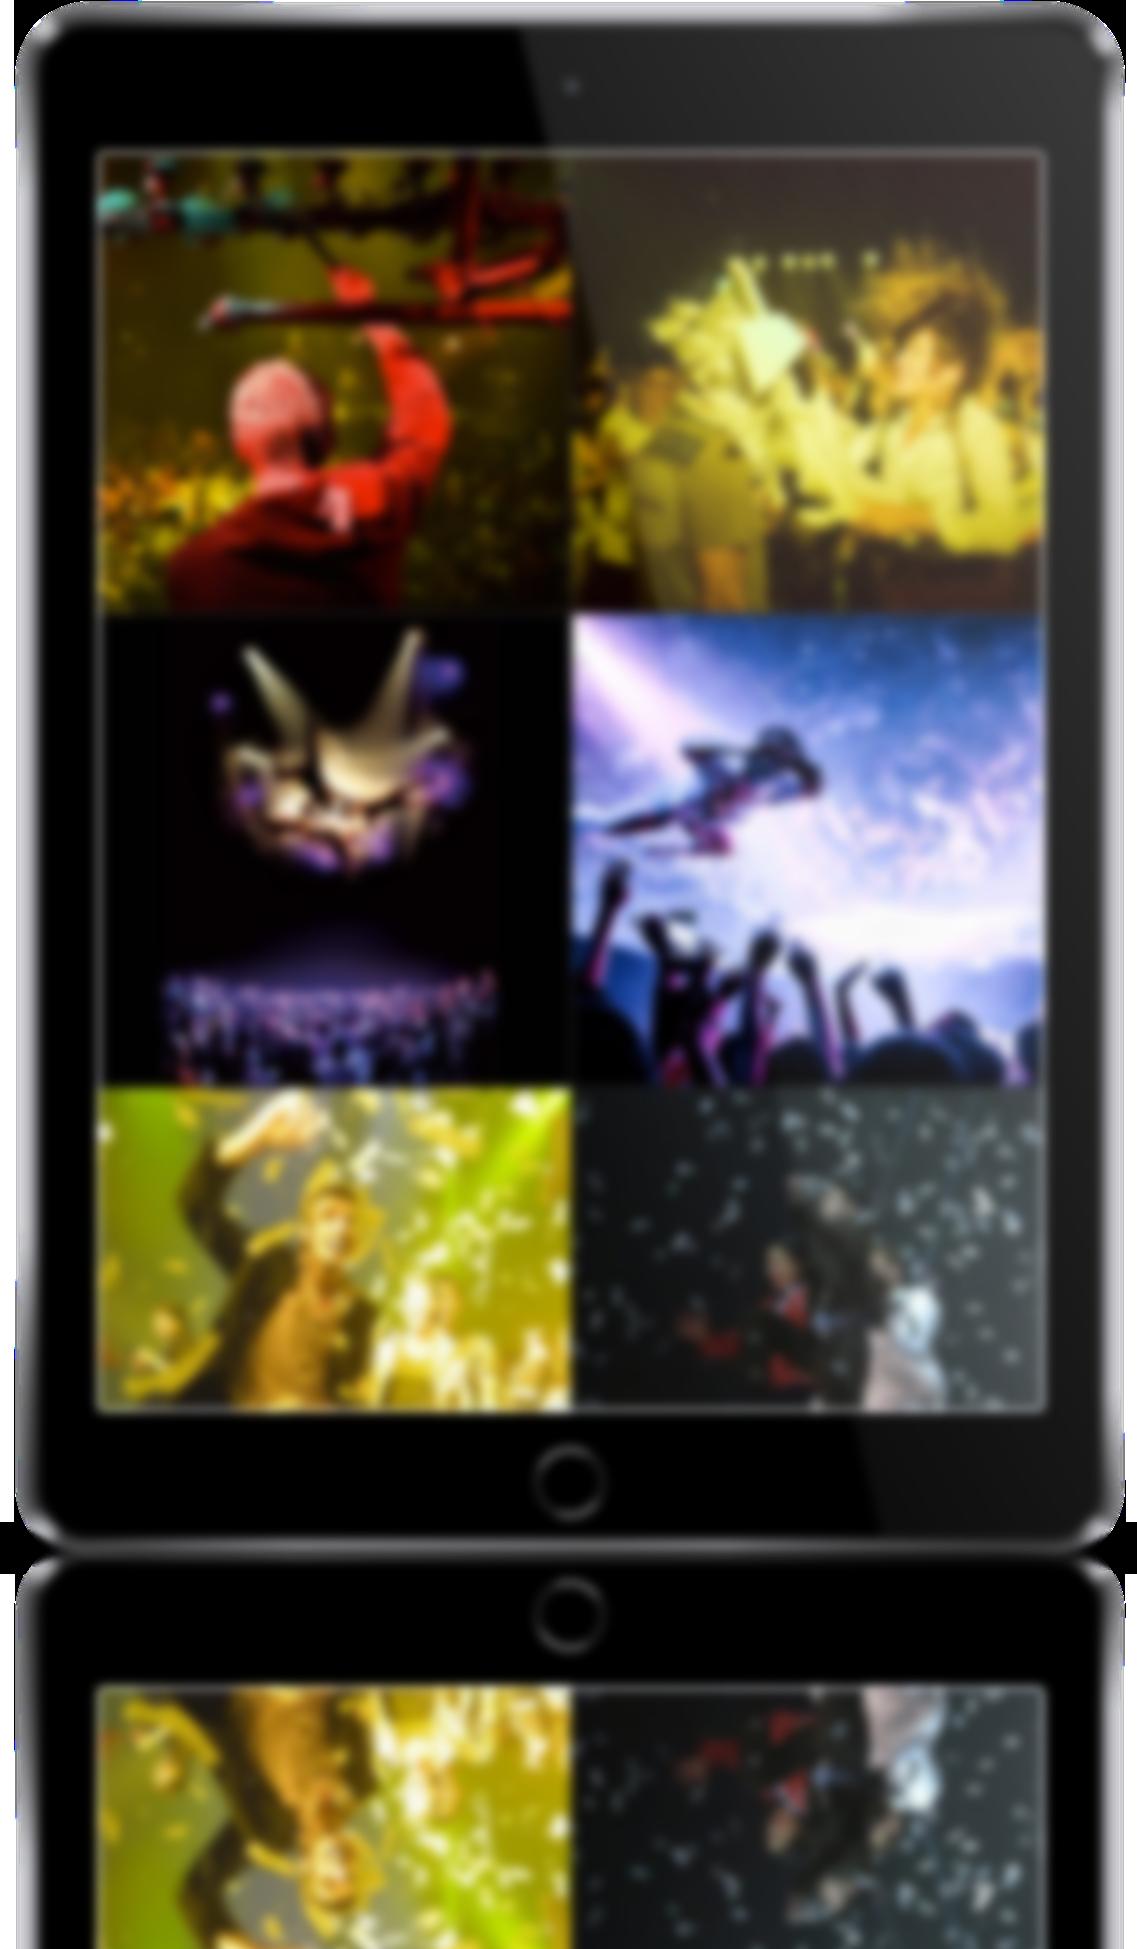 mockup tablet sviluppo sito internet fuerza bruta 1